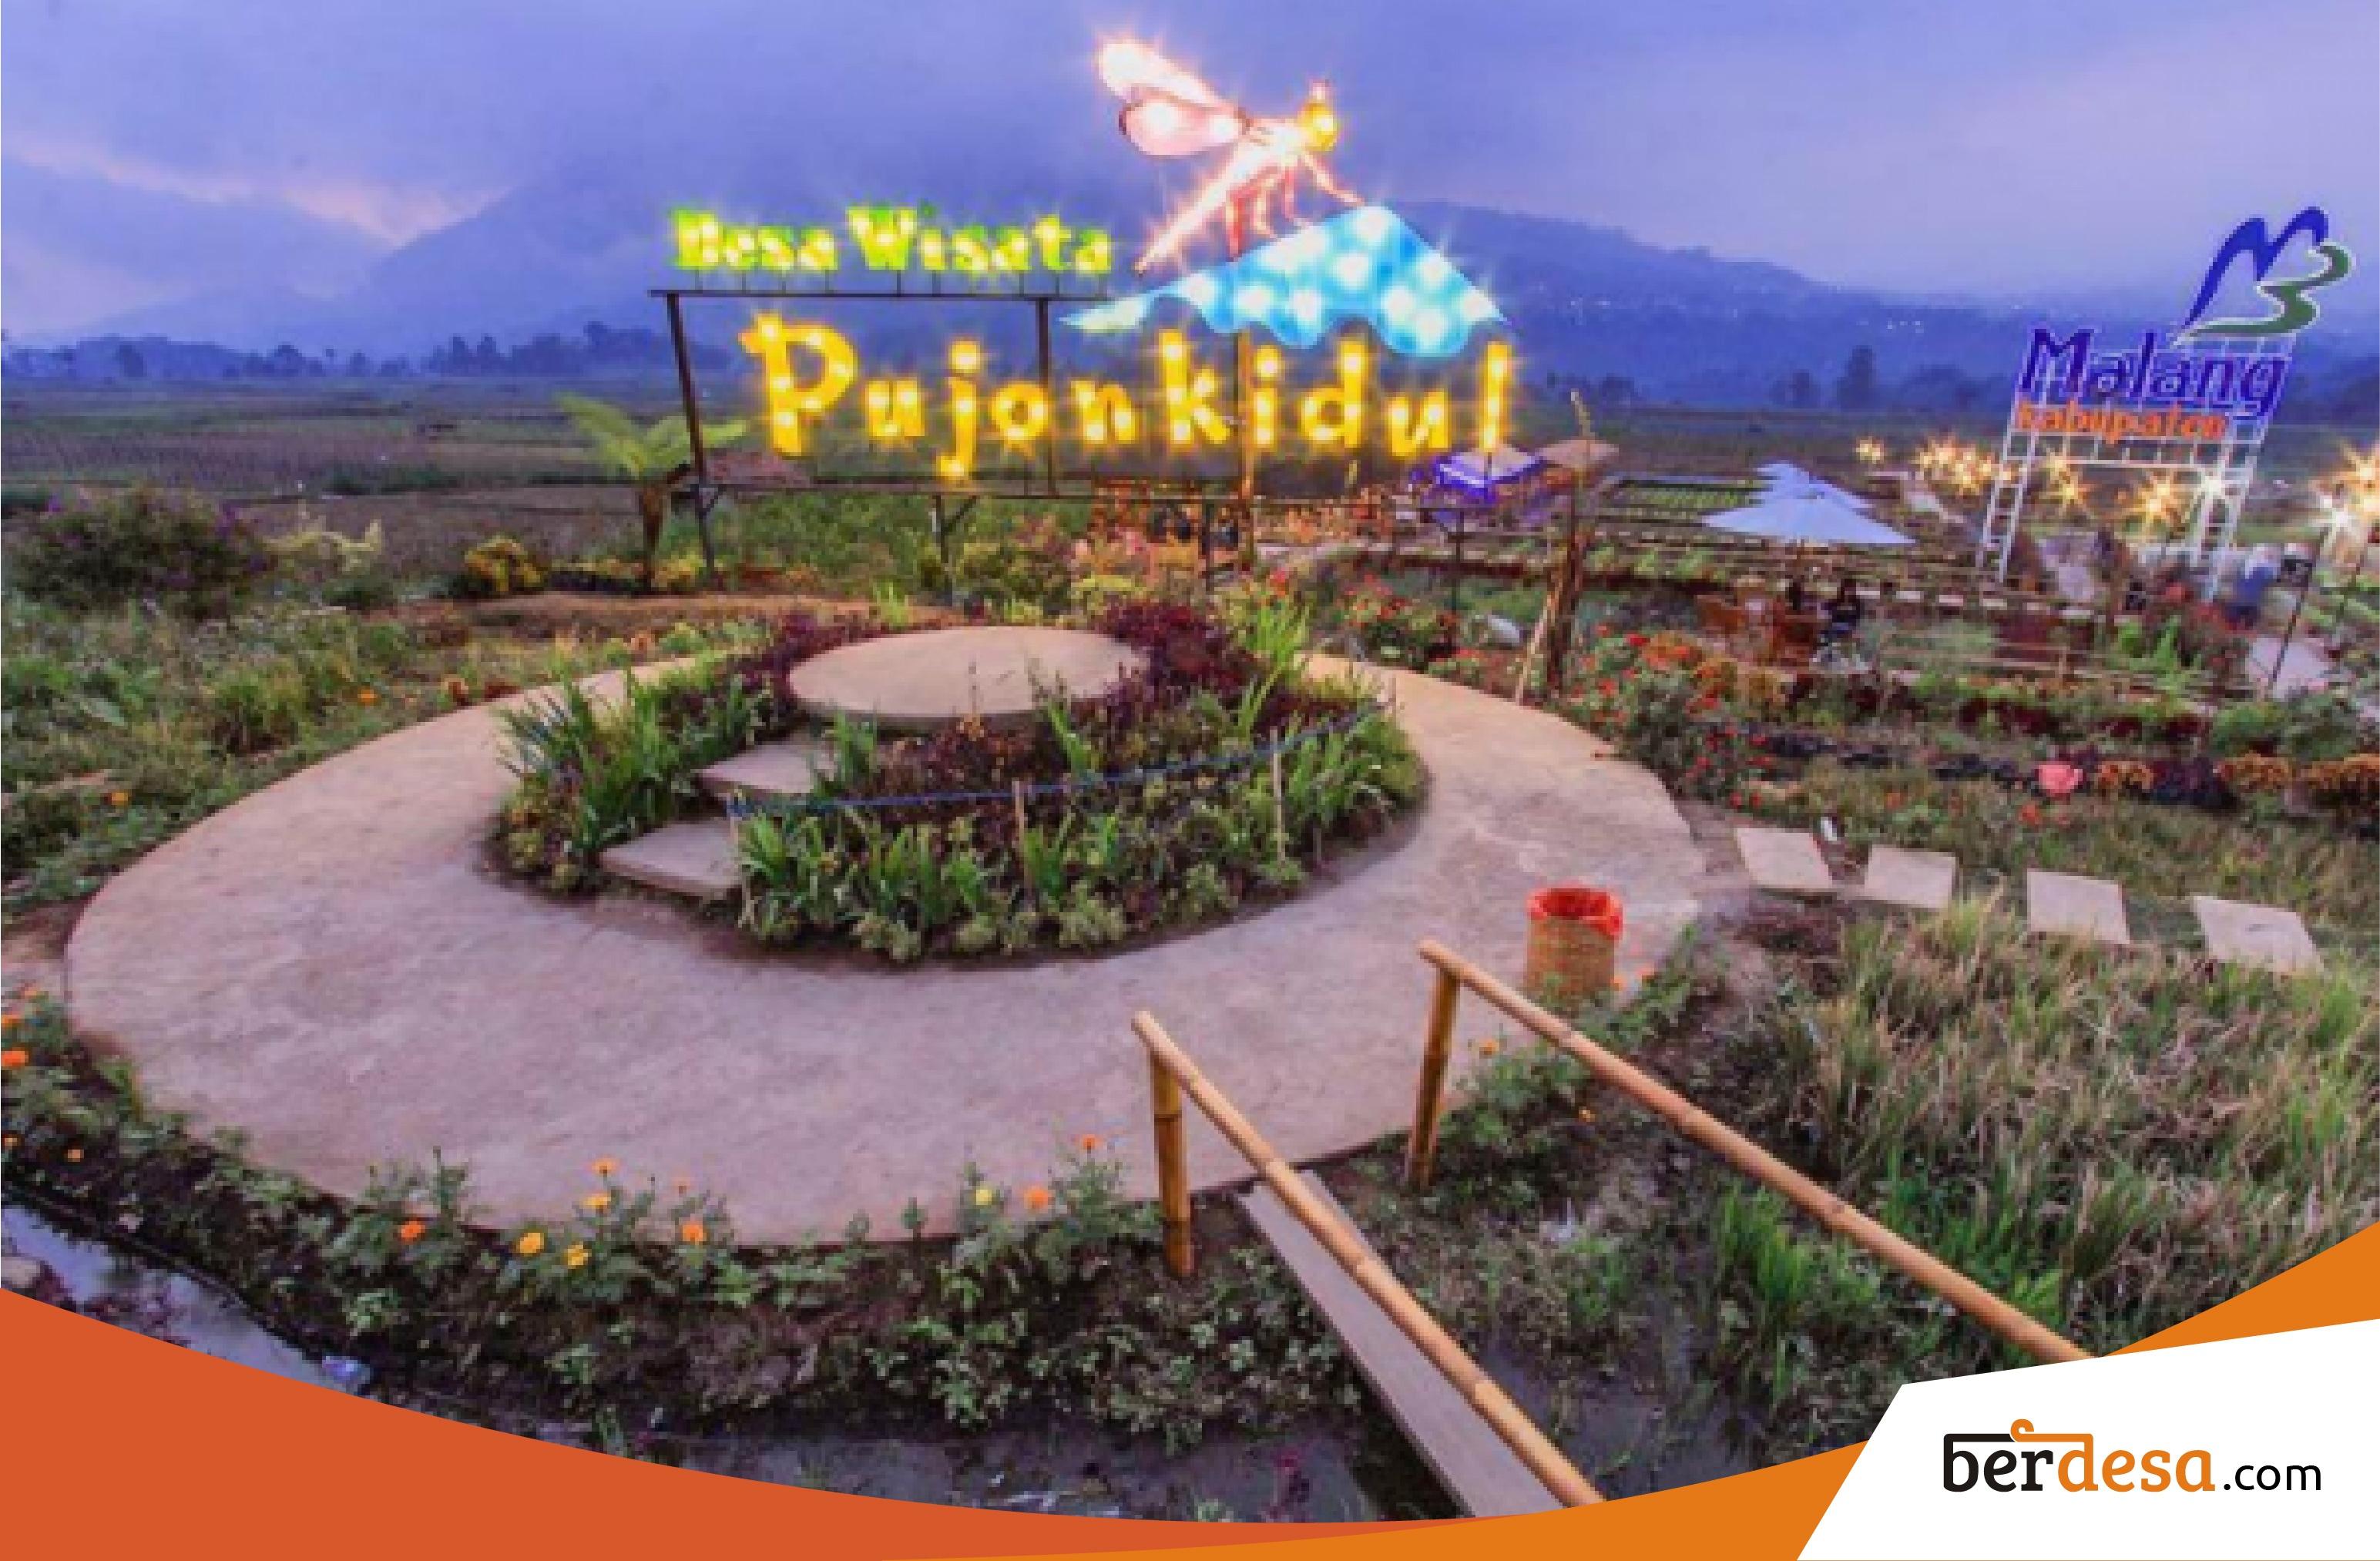 Destinasi Desa Agro Wisata Pujon Kidul Malang Berdesa